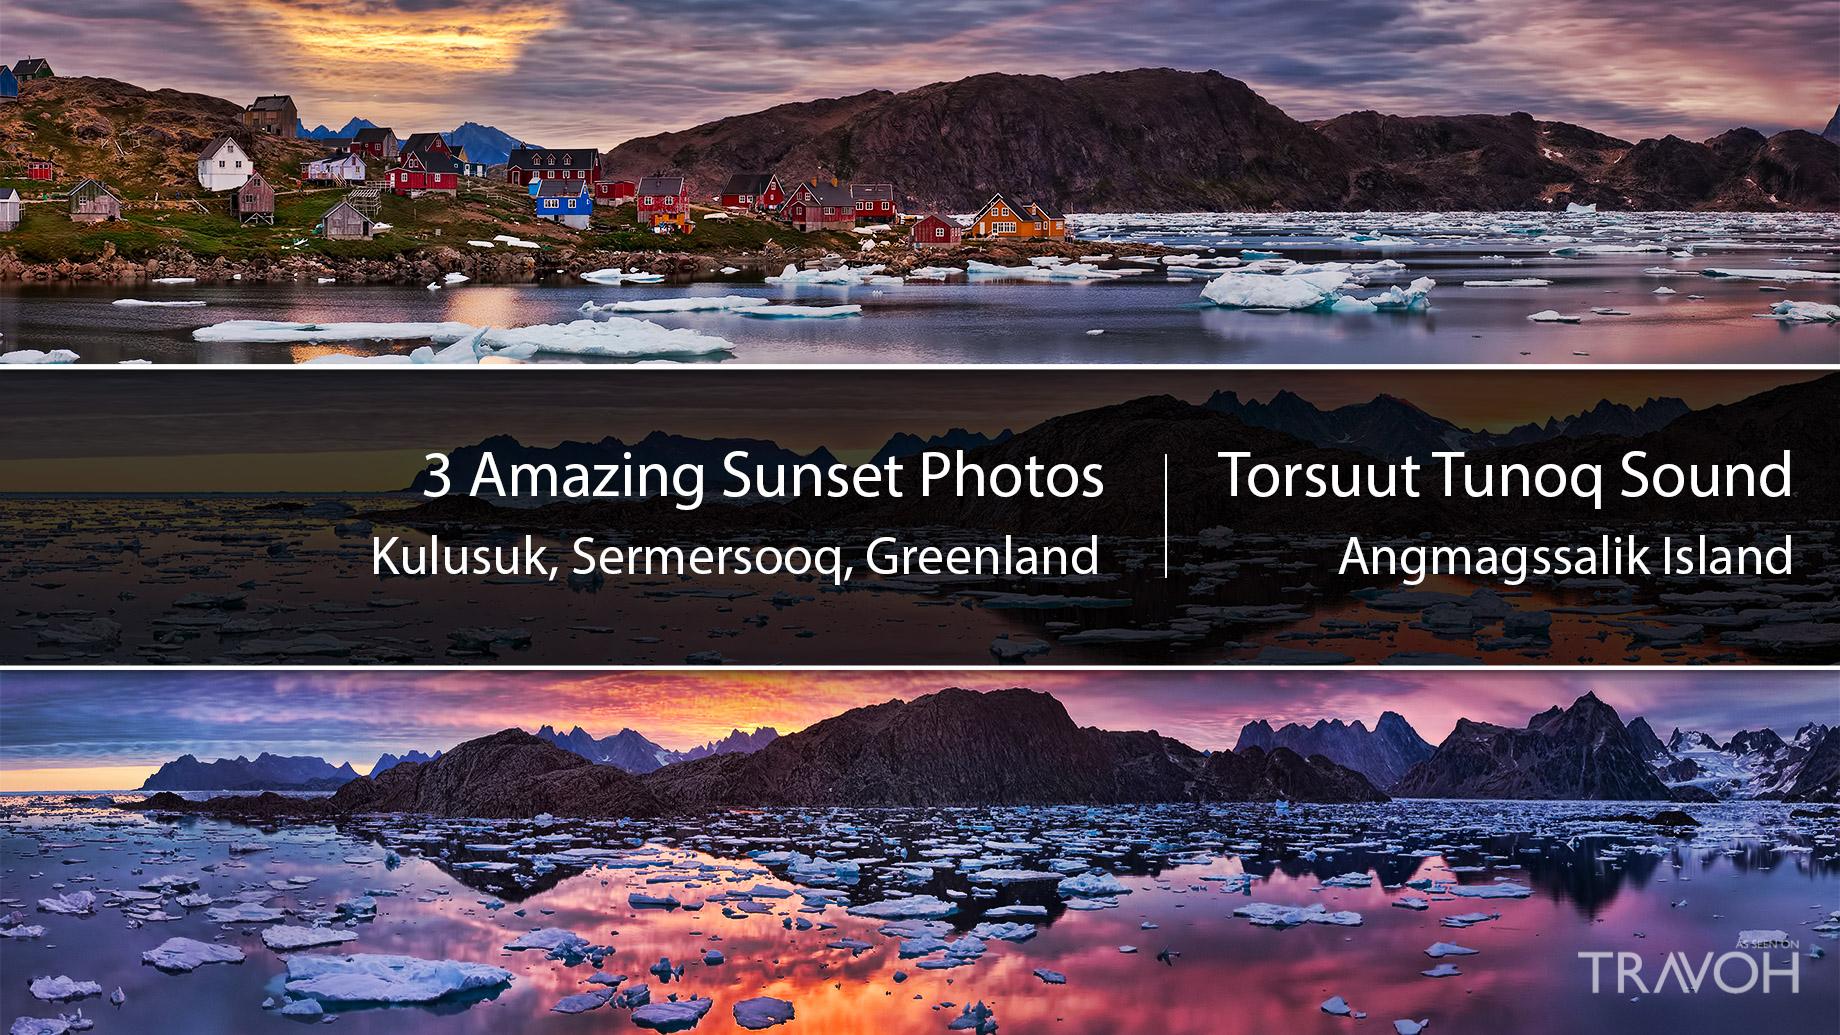 Experience Amazing Arctic Sunsets in Kulusuk, Greenland at Torsuut Tunoq Sound